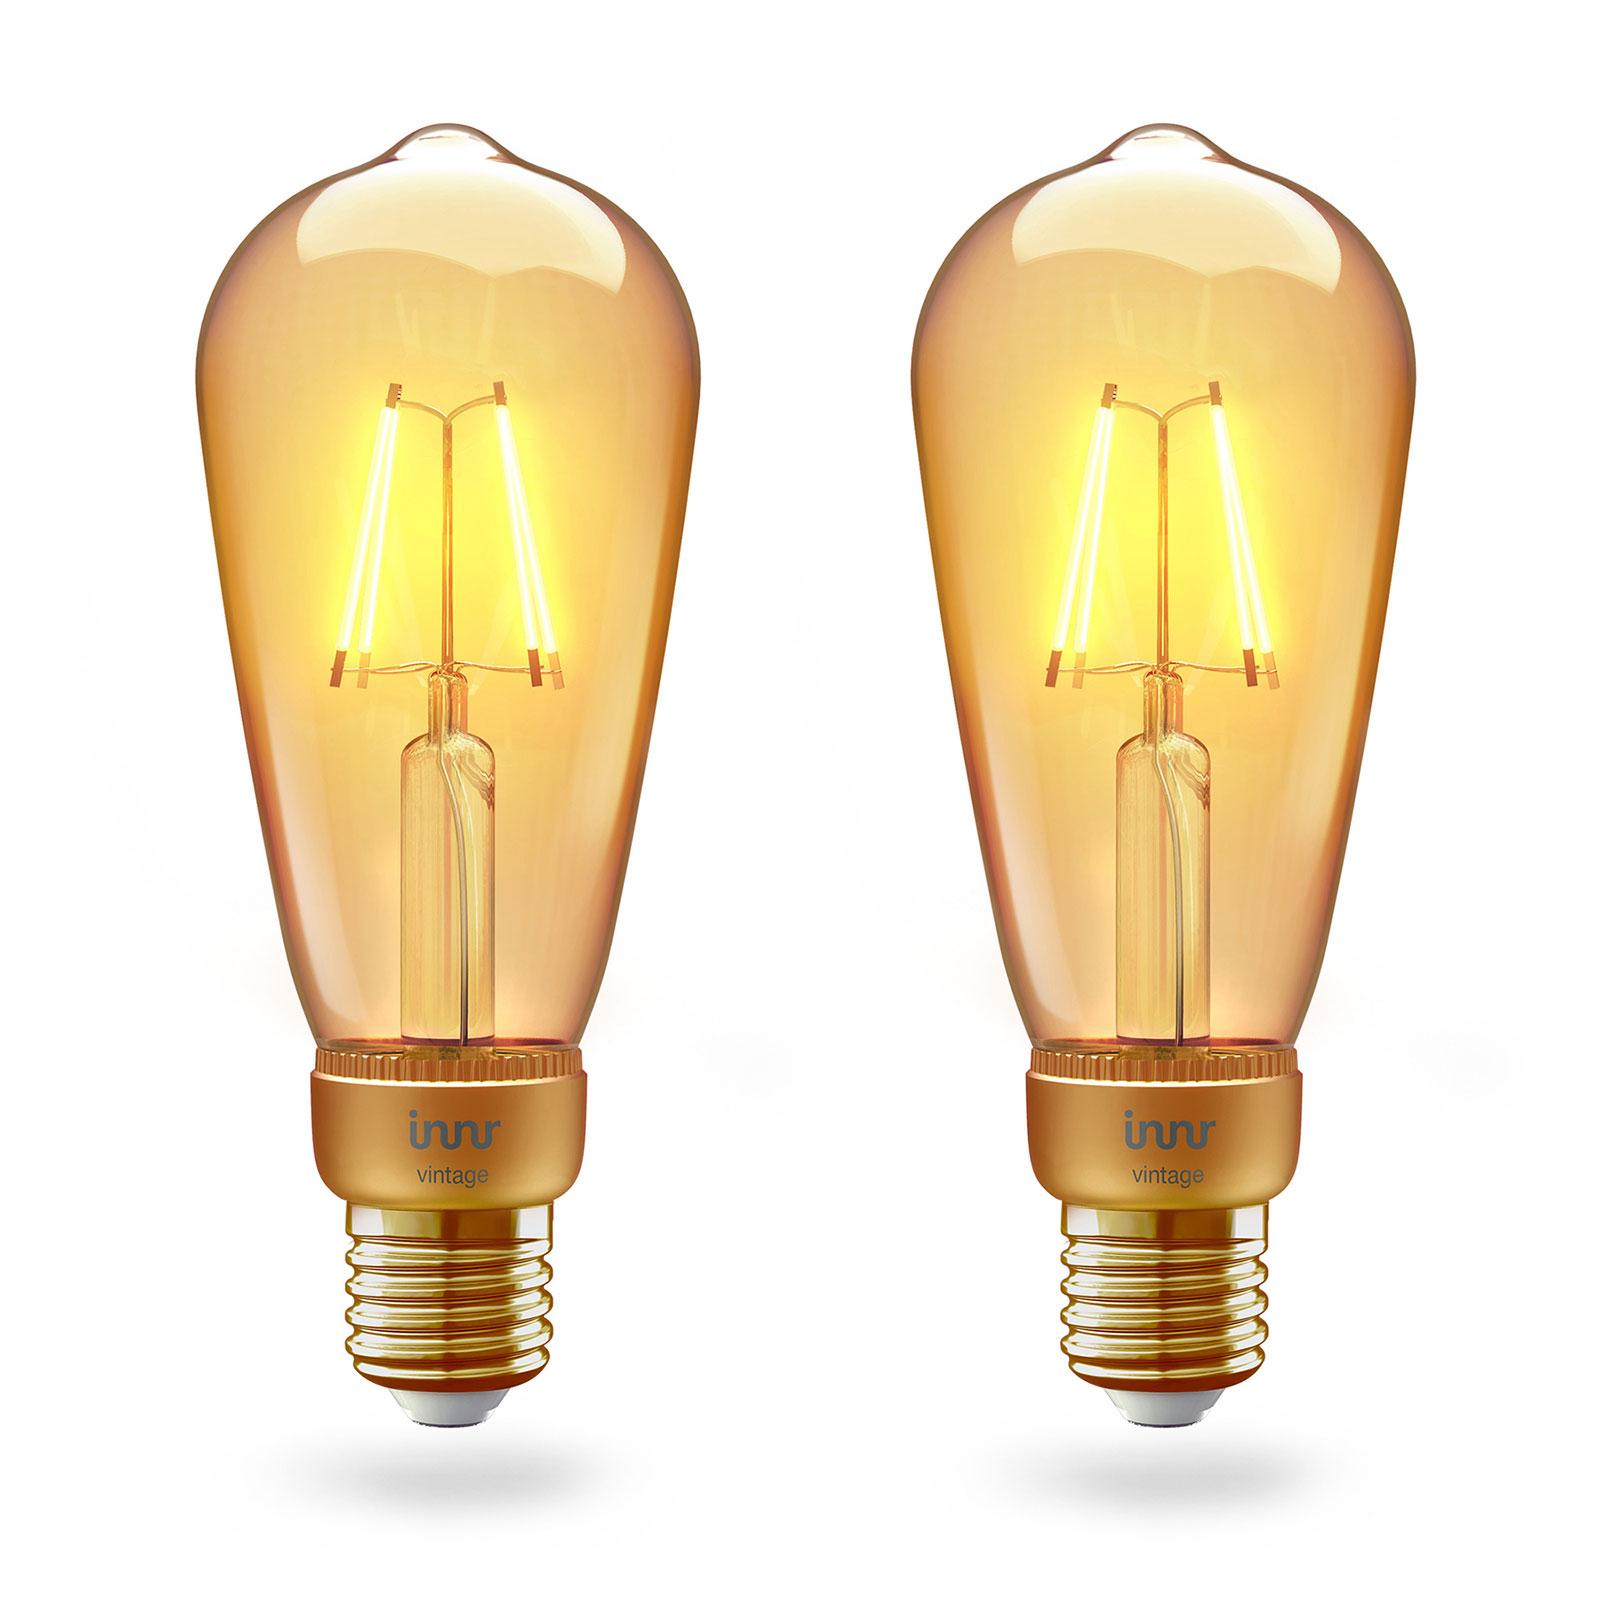 Innr LED-pære E27 filament Edison 2200K 4,2W 2er